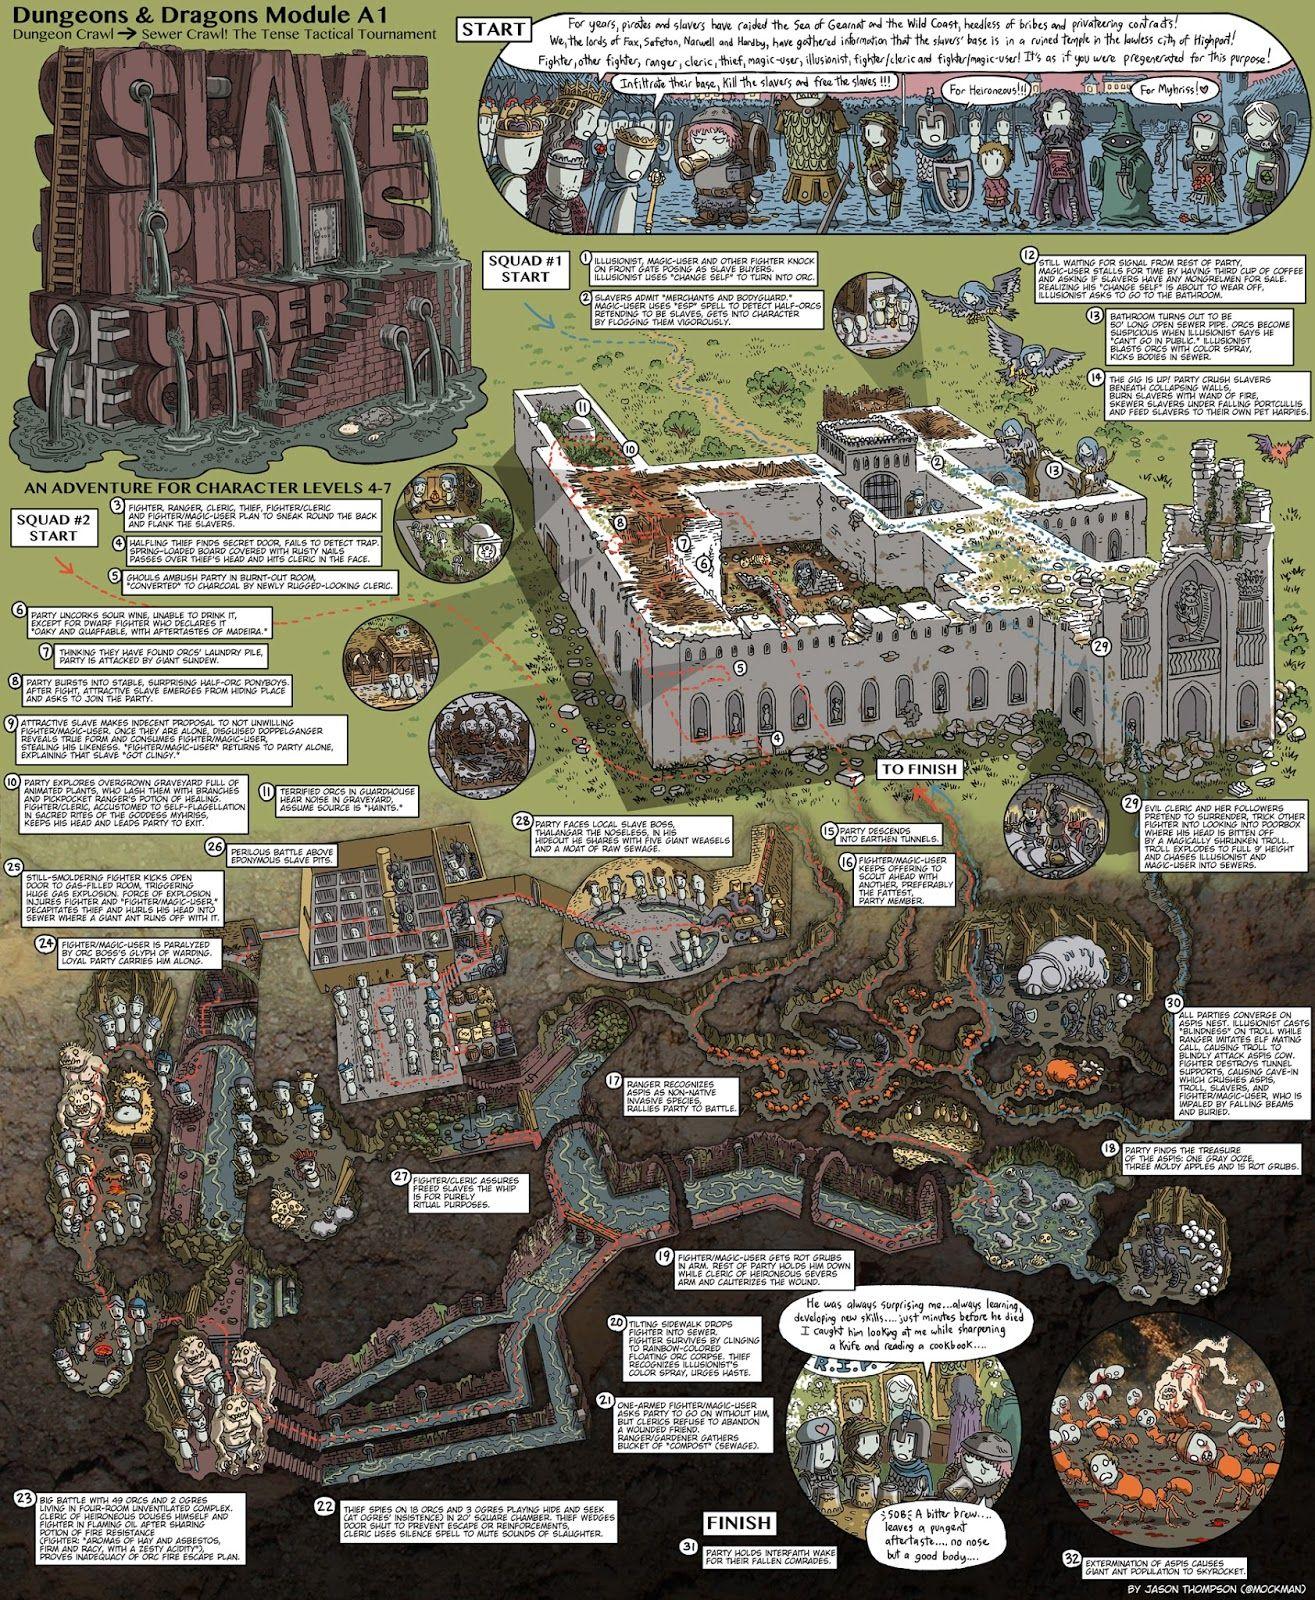 dwarf fortress adventure mode guide